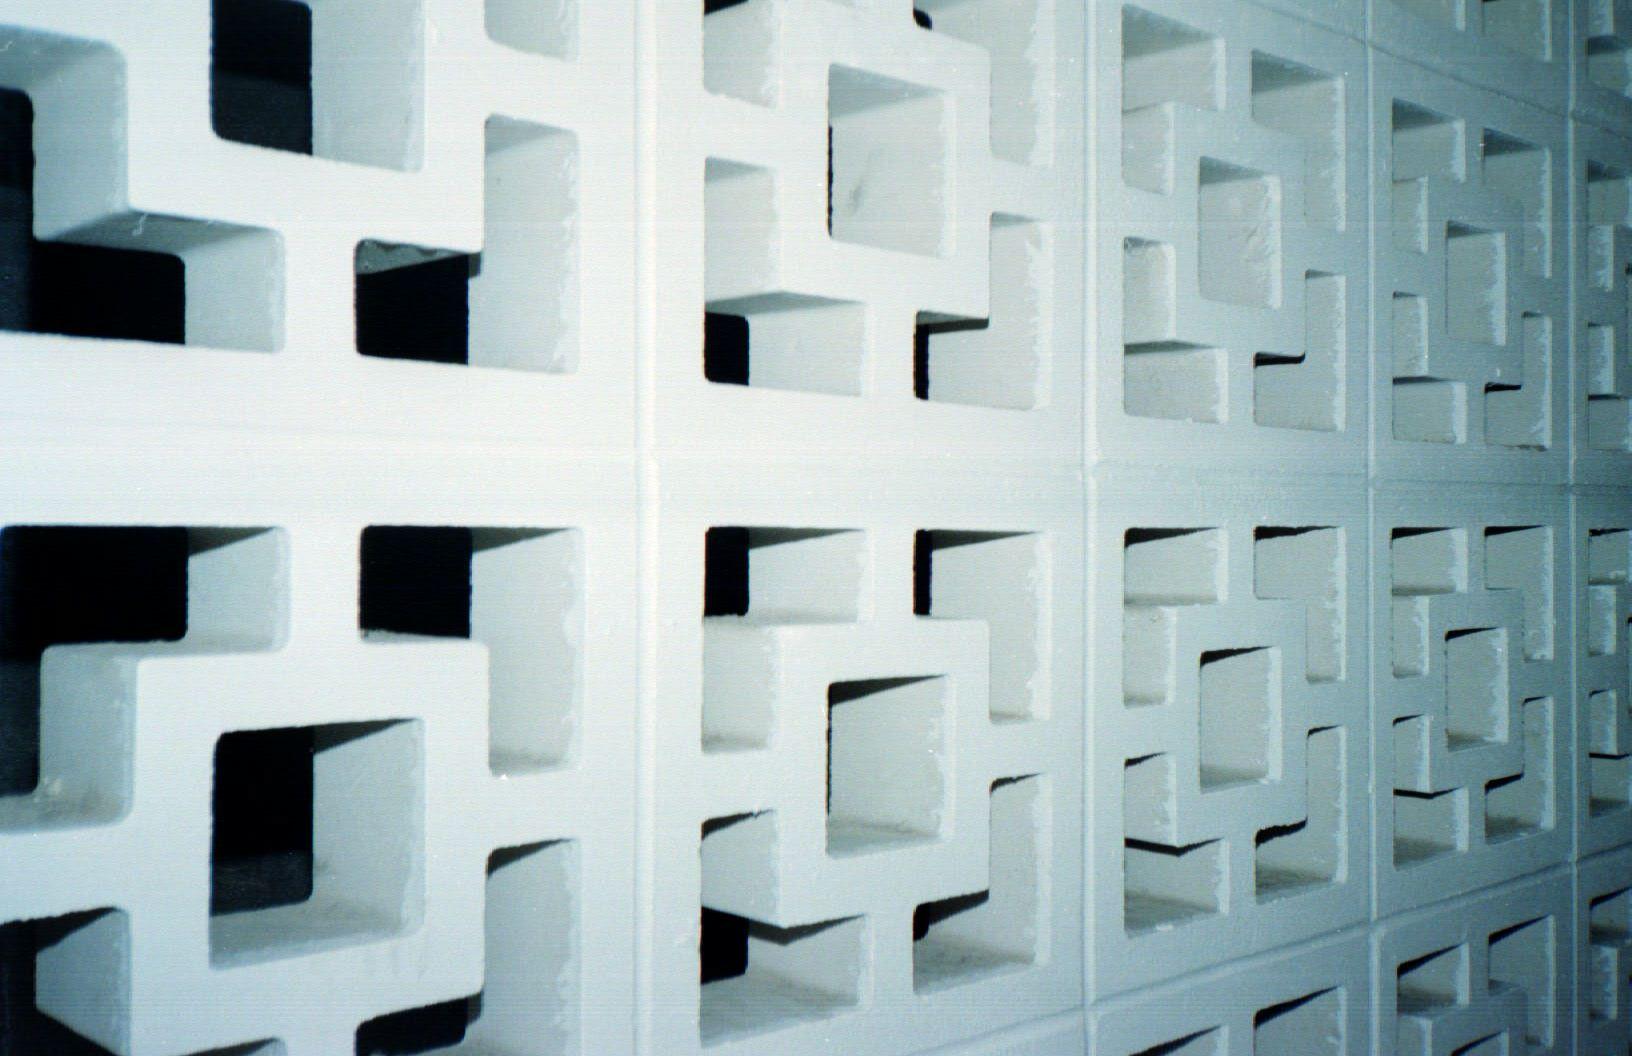 Brick Lattice Wall At A Hotel Love The Concrete Blocks Lattice Wall Concrete Blocks Privacy Walls